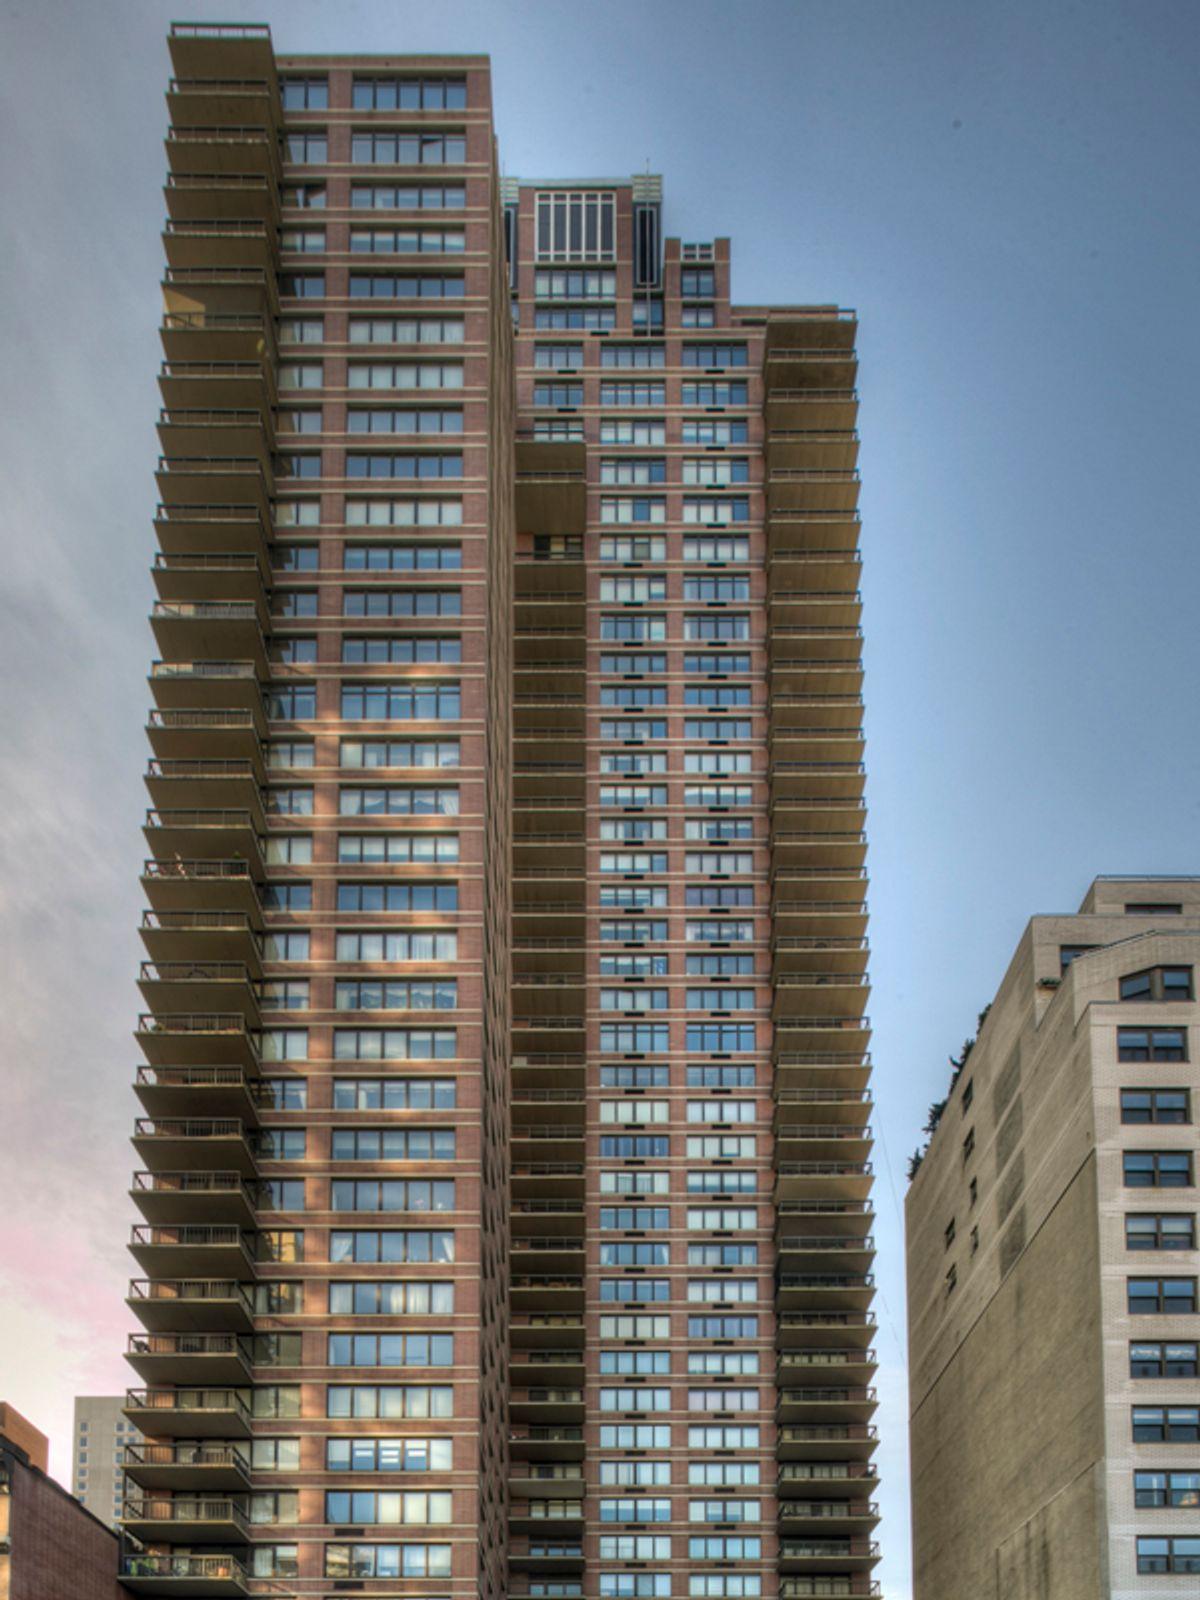 422 East 72nd Street